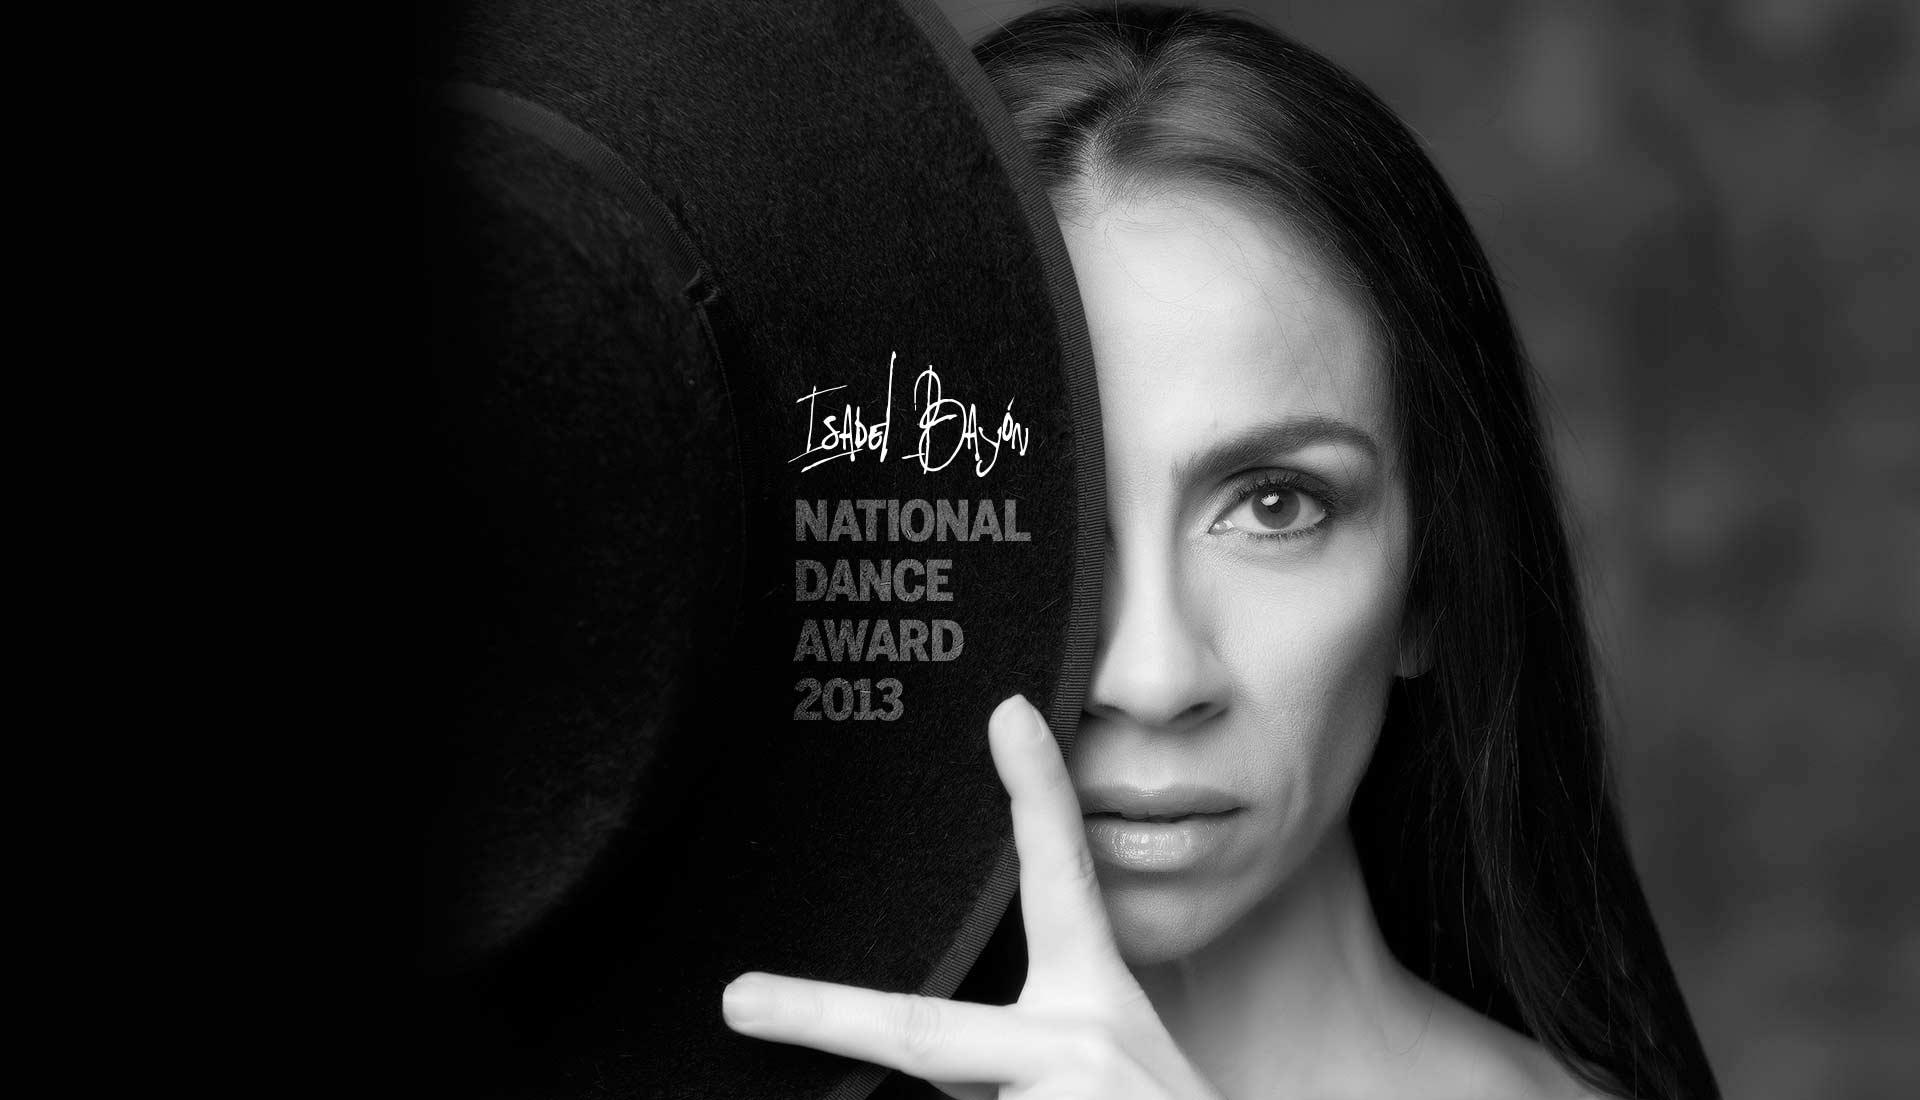 Isabel Bayón, National Dance Award 2013